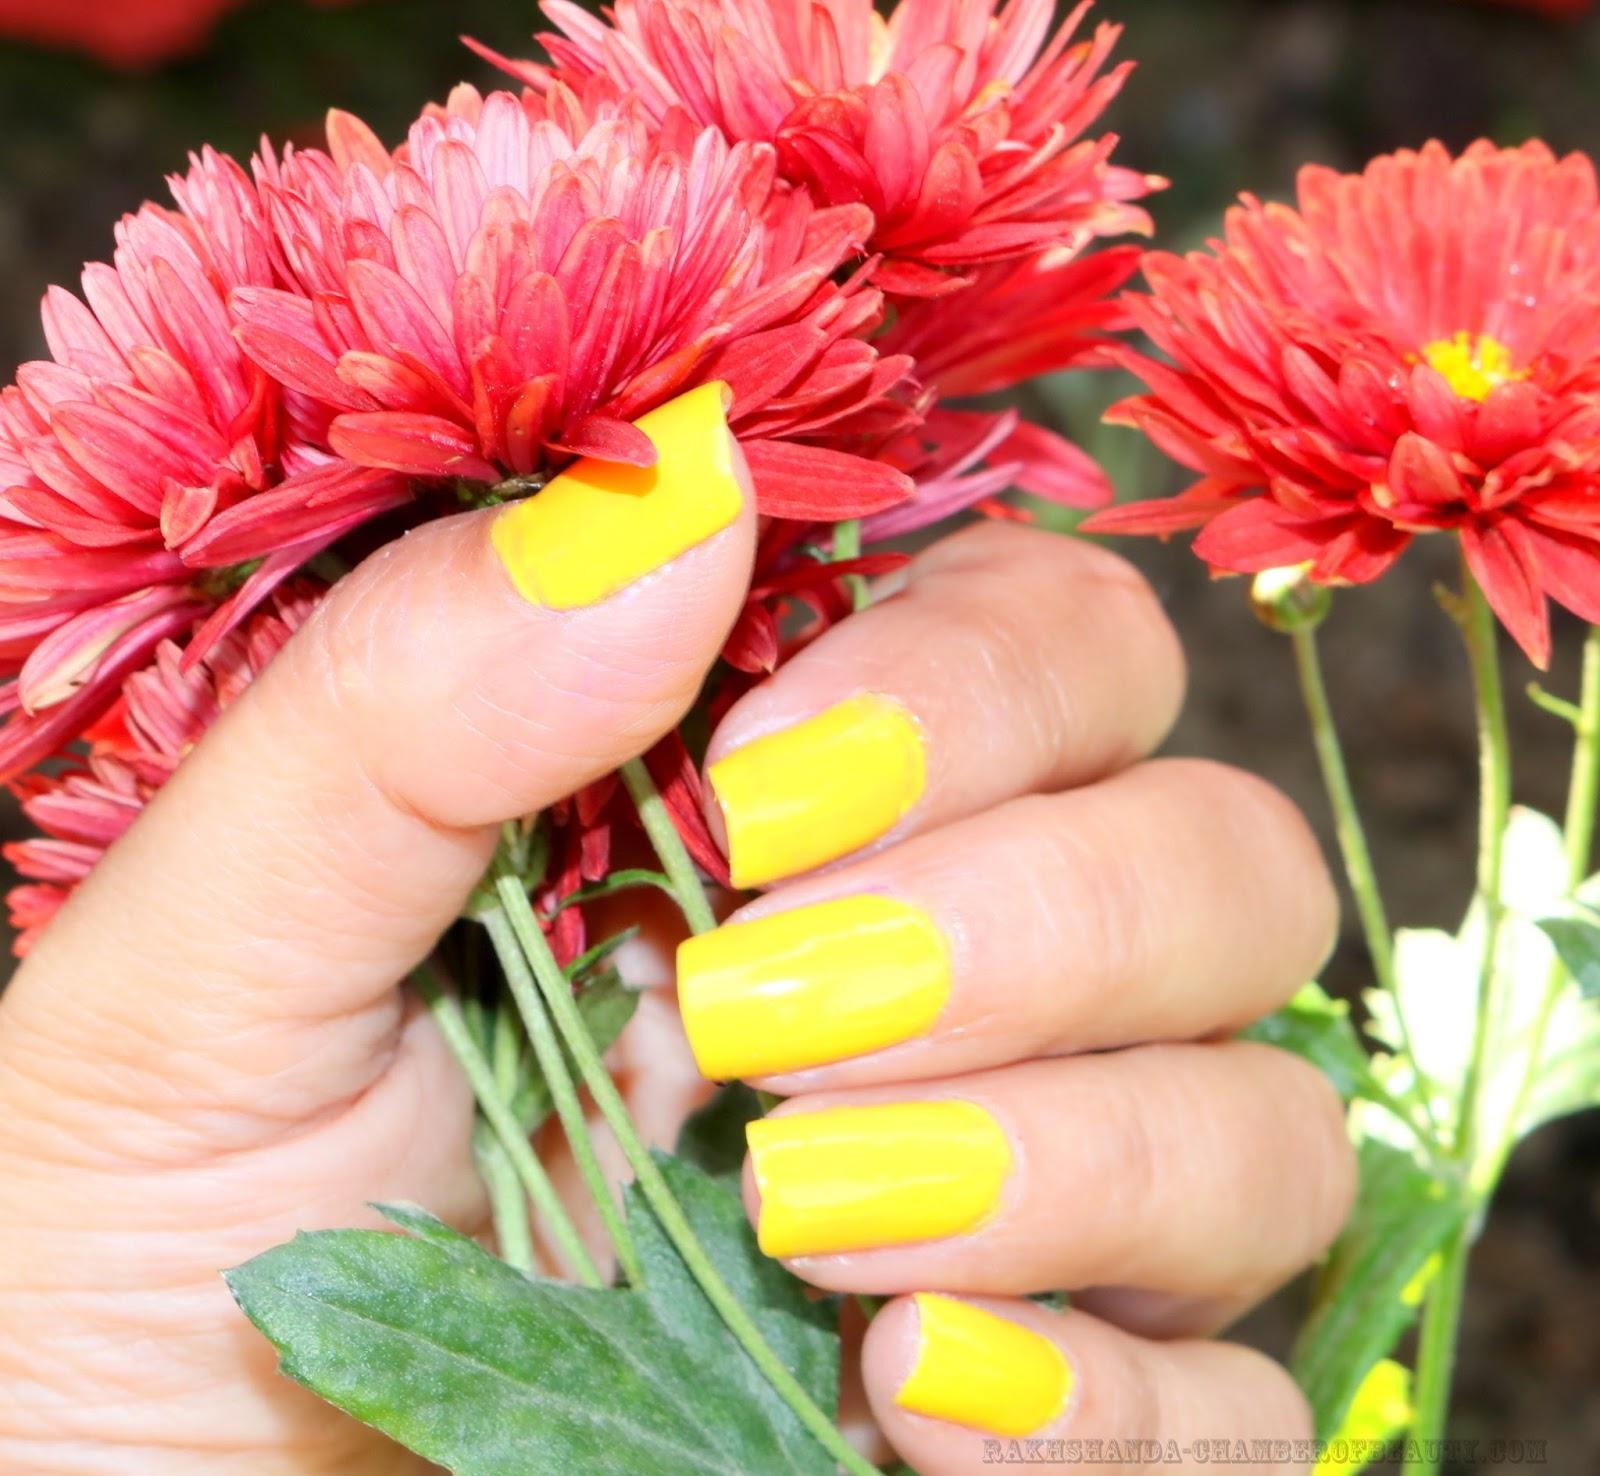 rakhshanda-chamberofbeauty.com/MAYBELLINE COLOR SHOW Sweet Sunshine - NOTD